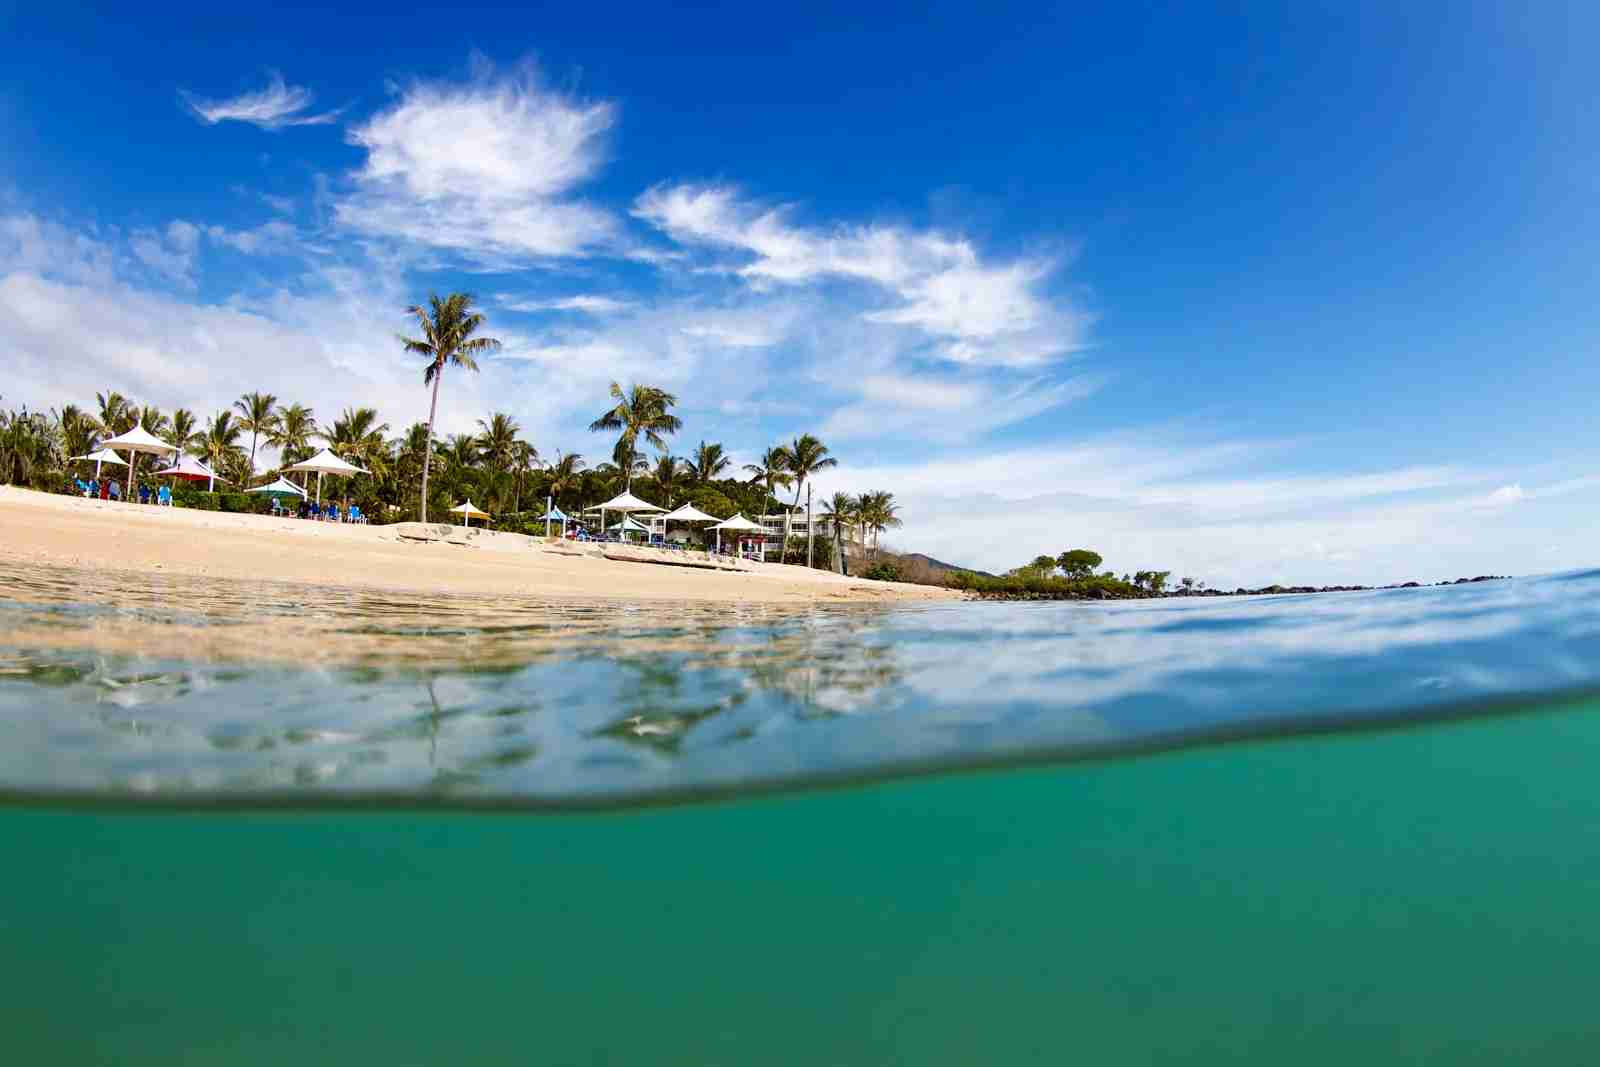 A beach on Daydream Island in Queensland. (Photo via Shutterstock)